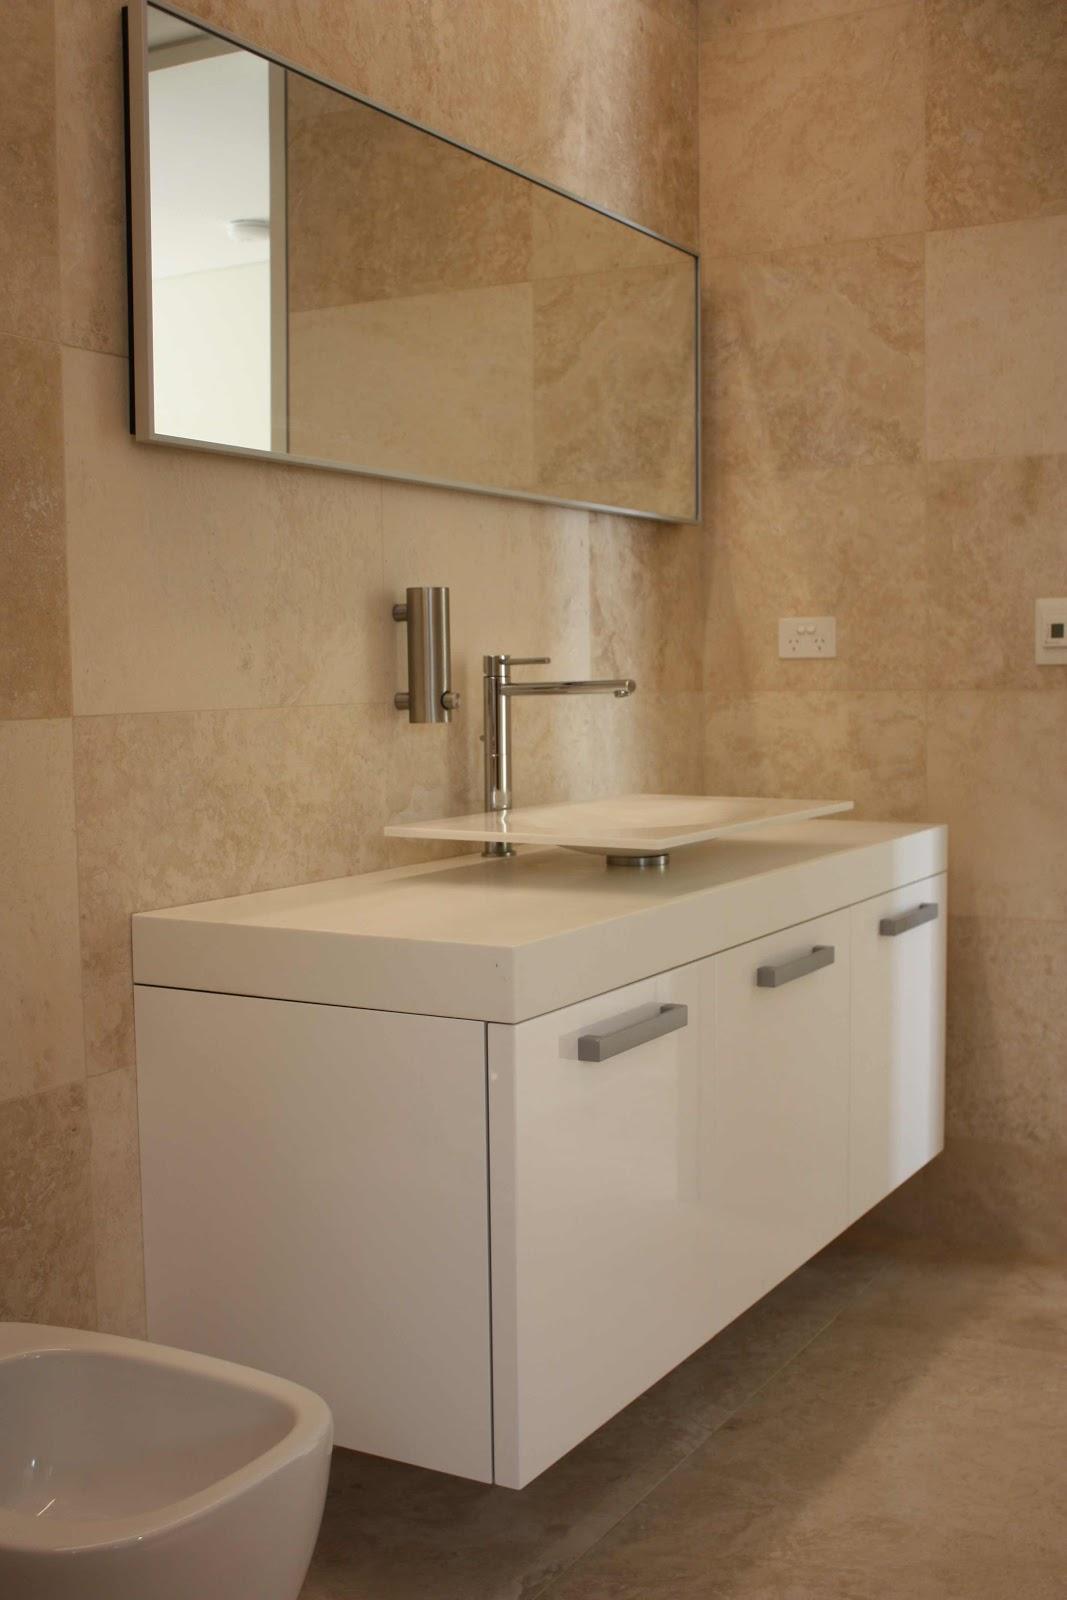 Minosa: Travertine bathrooms, the natural choice - Modern ...